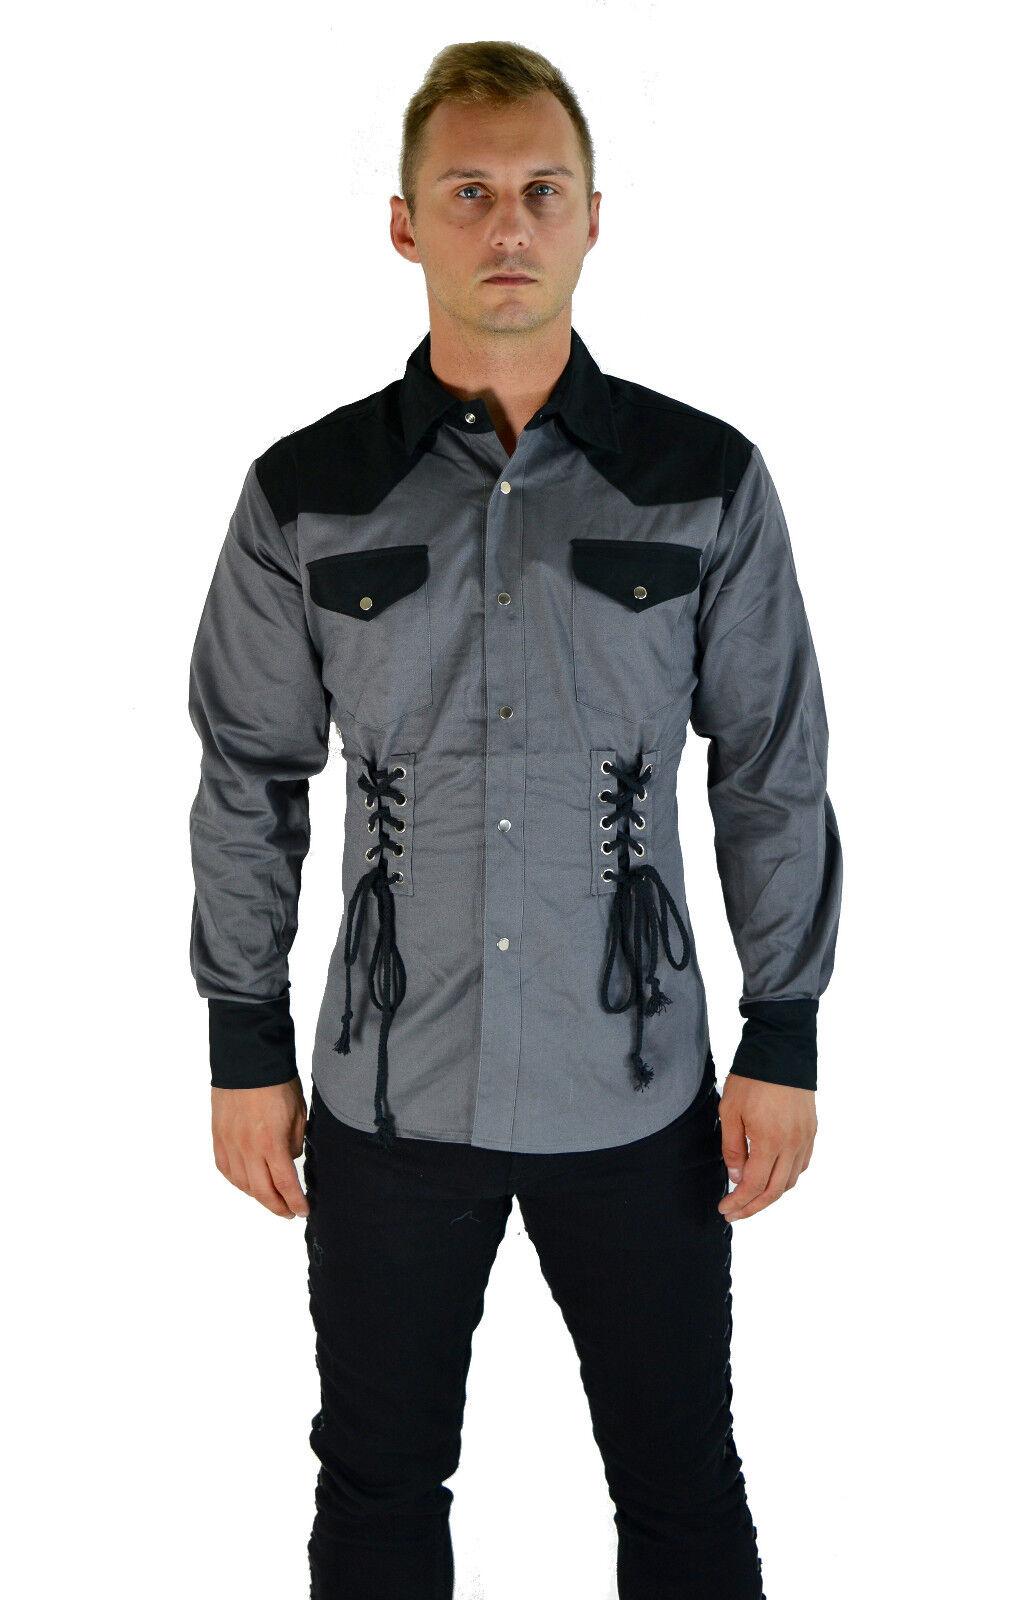 SHRINE GOTHIC CORSET PUNK STEAMPUNK ROCKER FETISH COWBOY GOTH BIKER JACKET SHIRT Casual Button-Down Shirts